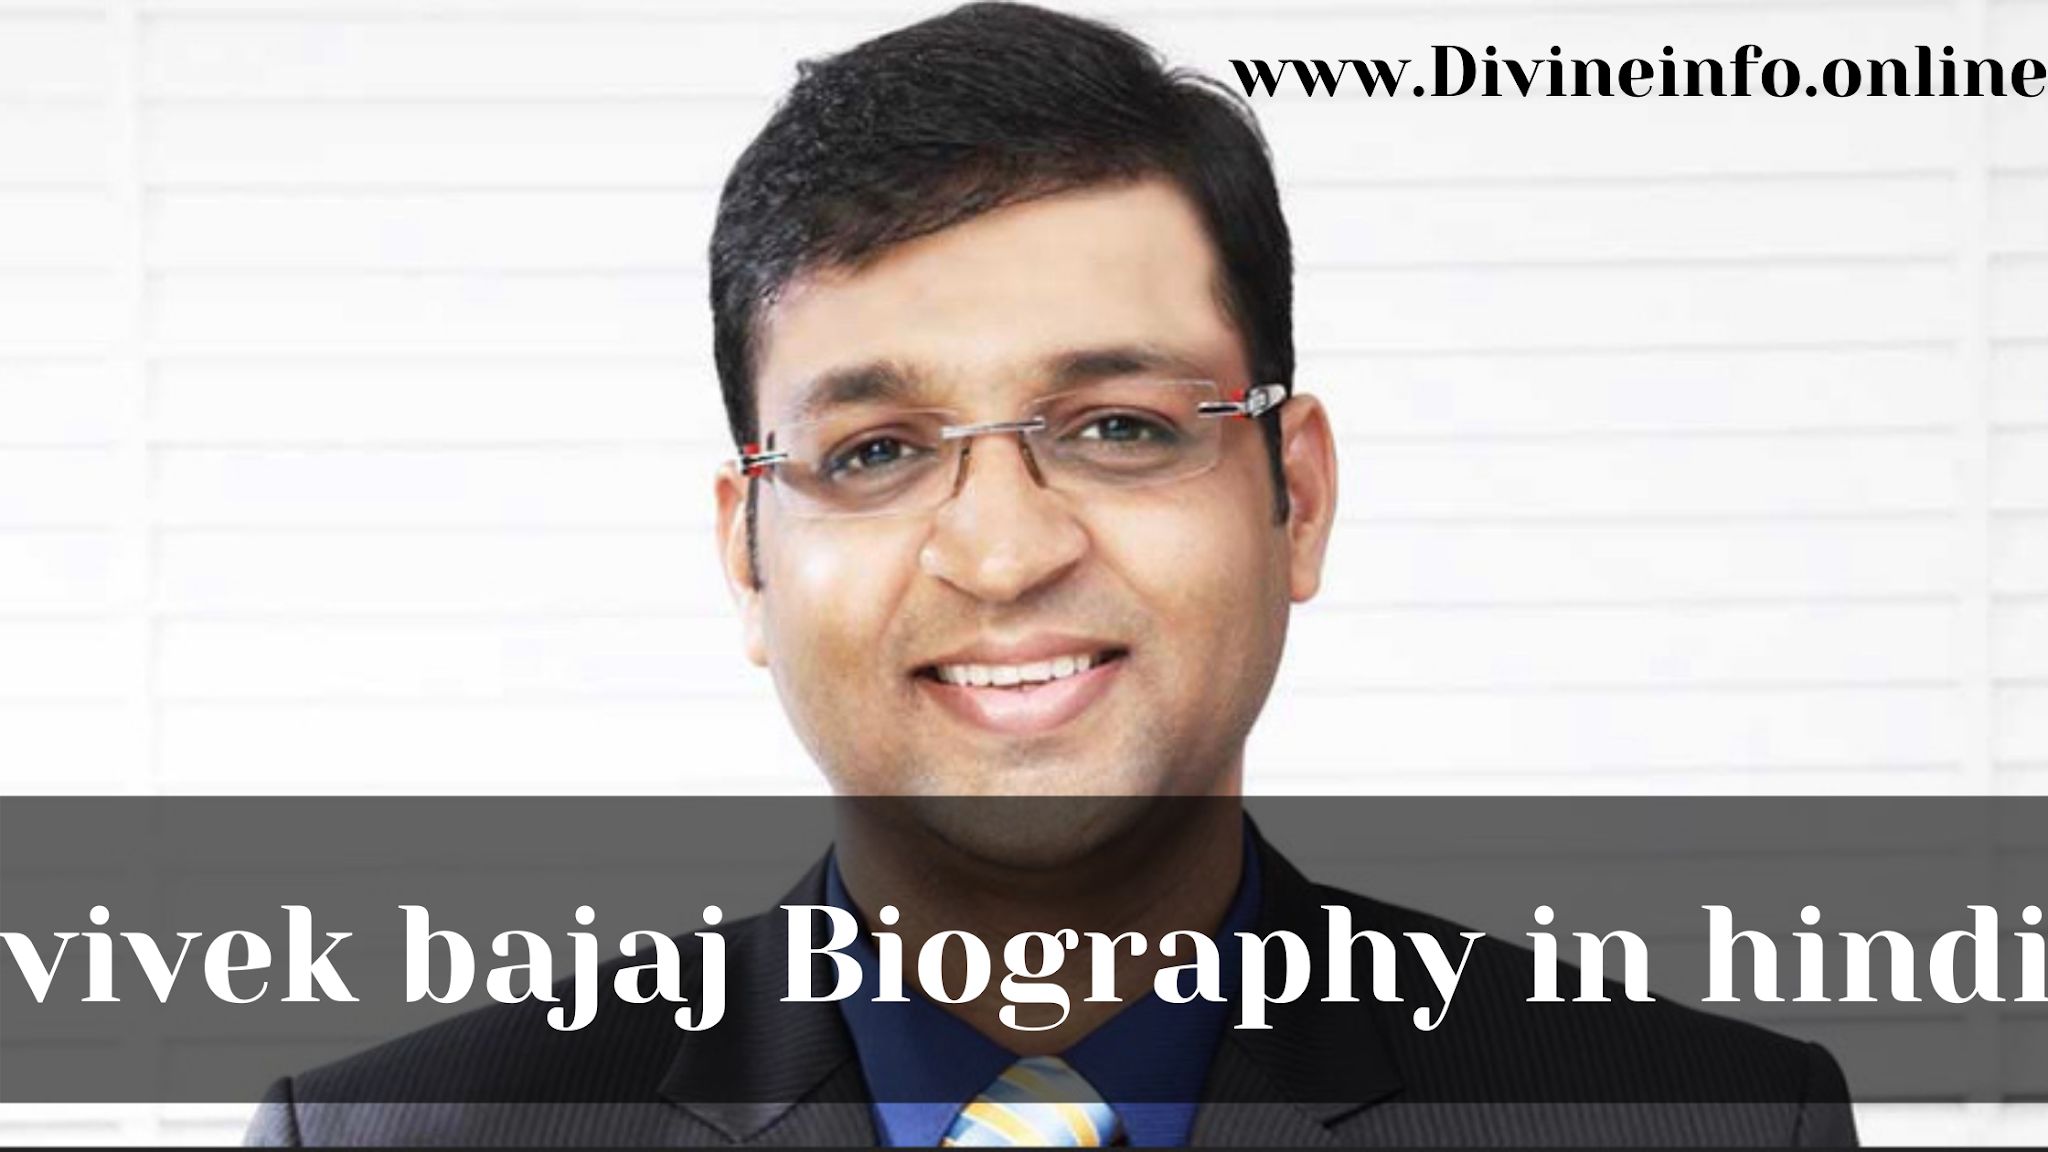 VIVEK BAJAJ  BIOGRAPHY IN HINDI | विवेक बजाज का  जीवन परिचय vivek bajaj stockedge